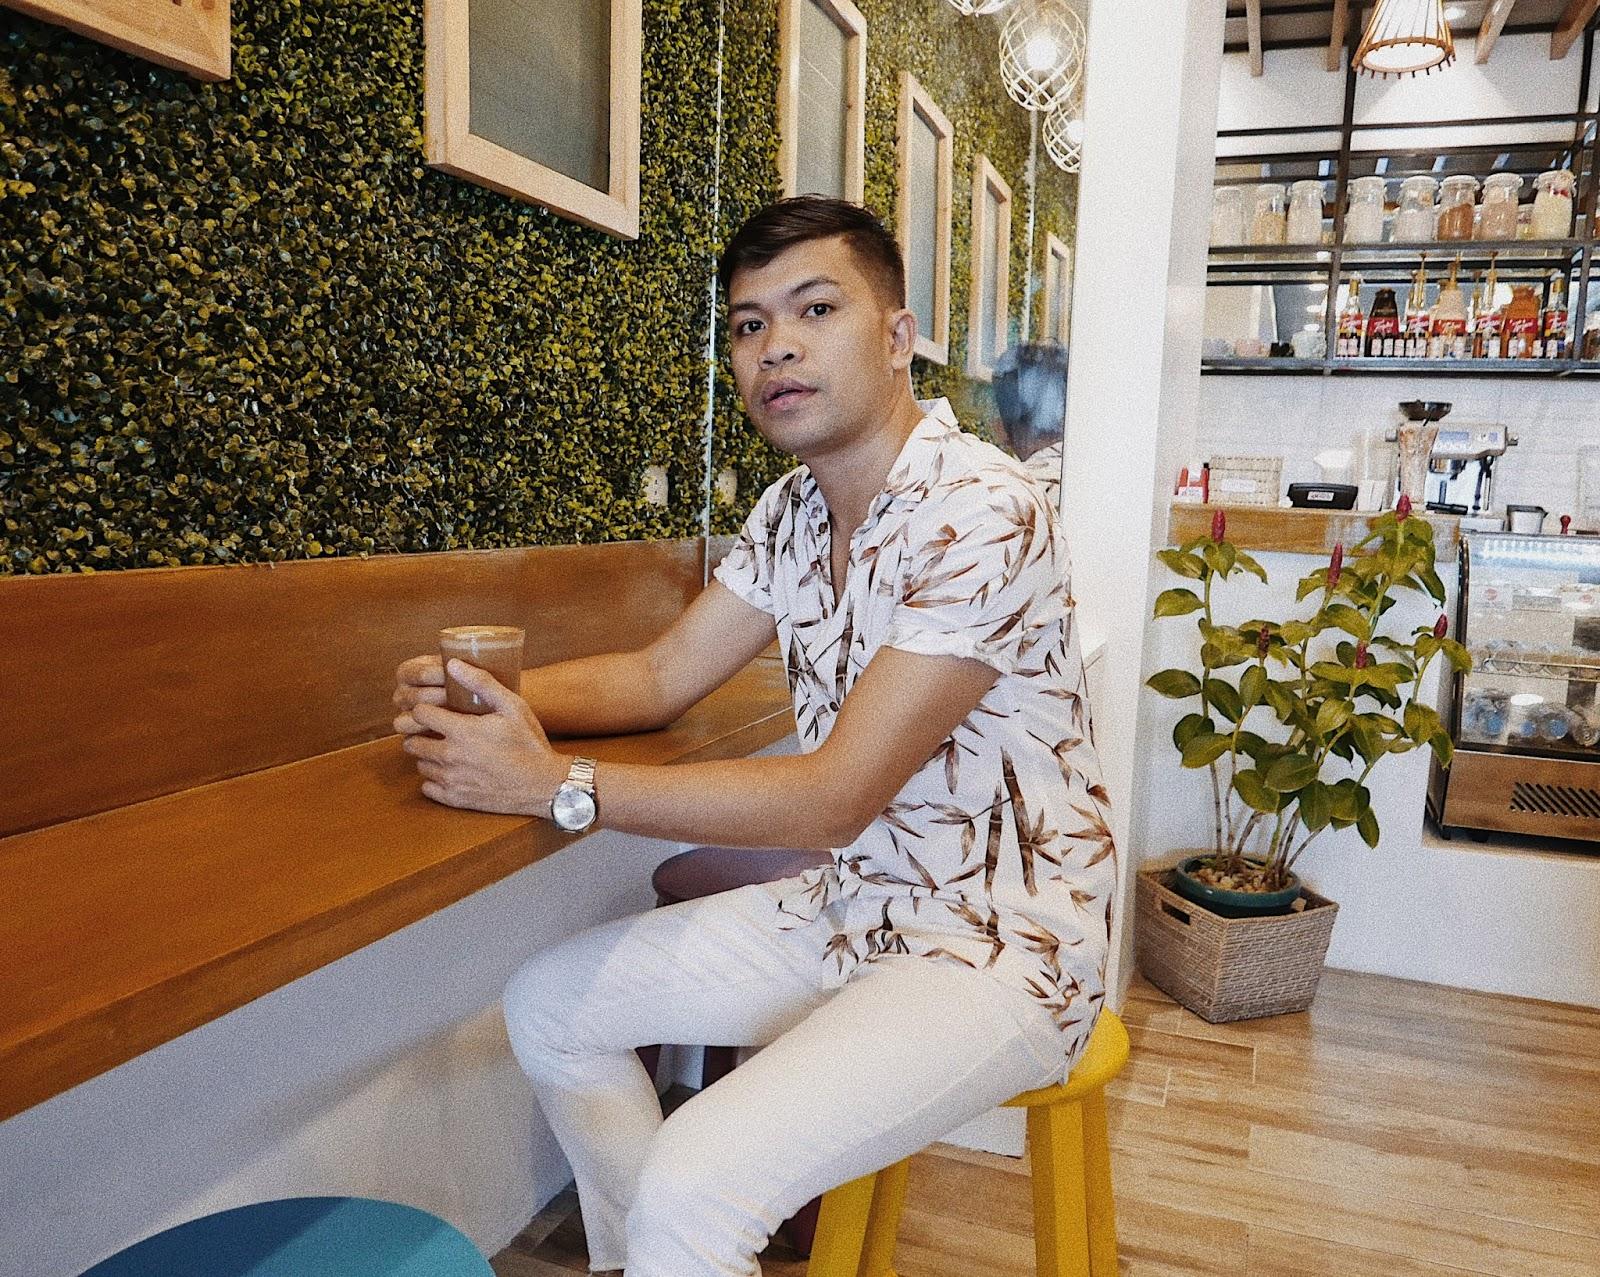 aloha-mana-spa-cafe-cebu-bloggers-almostablogger.jpg